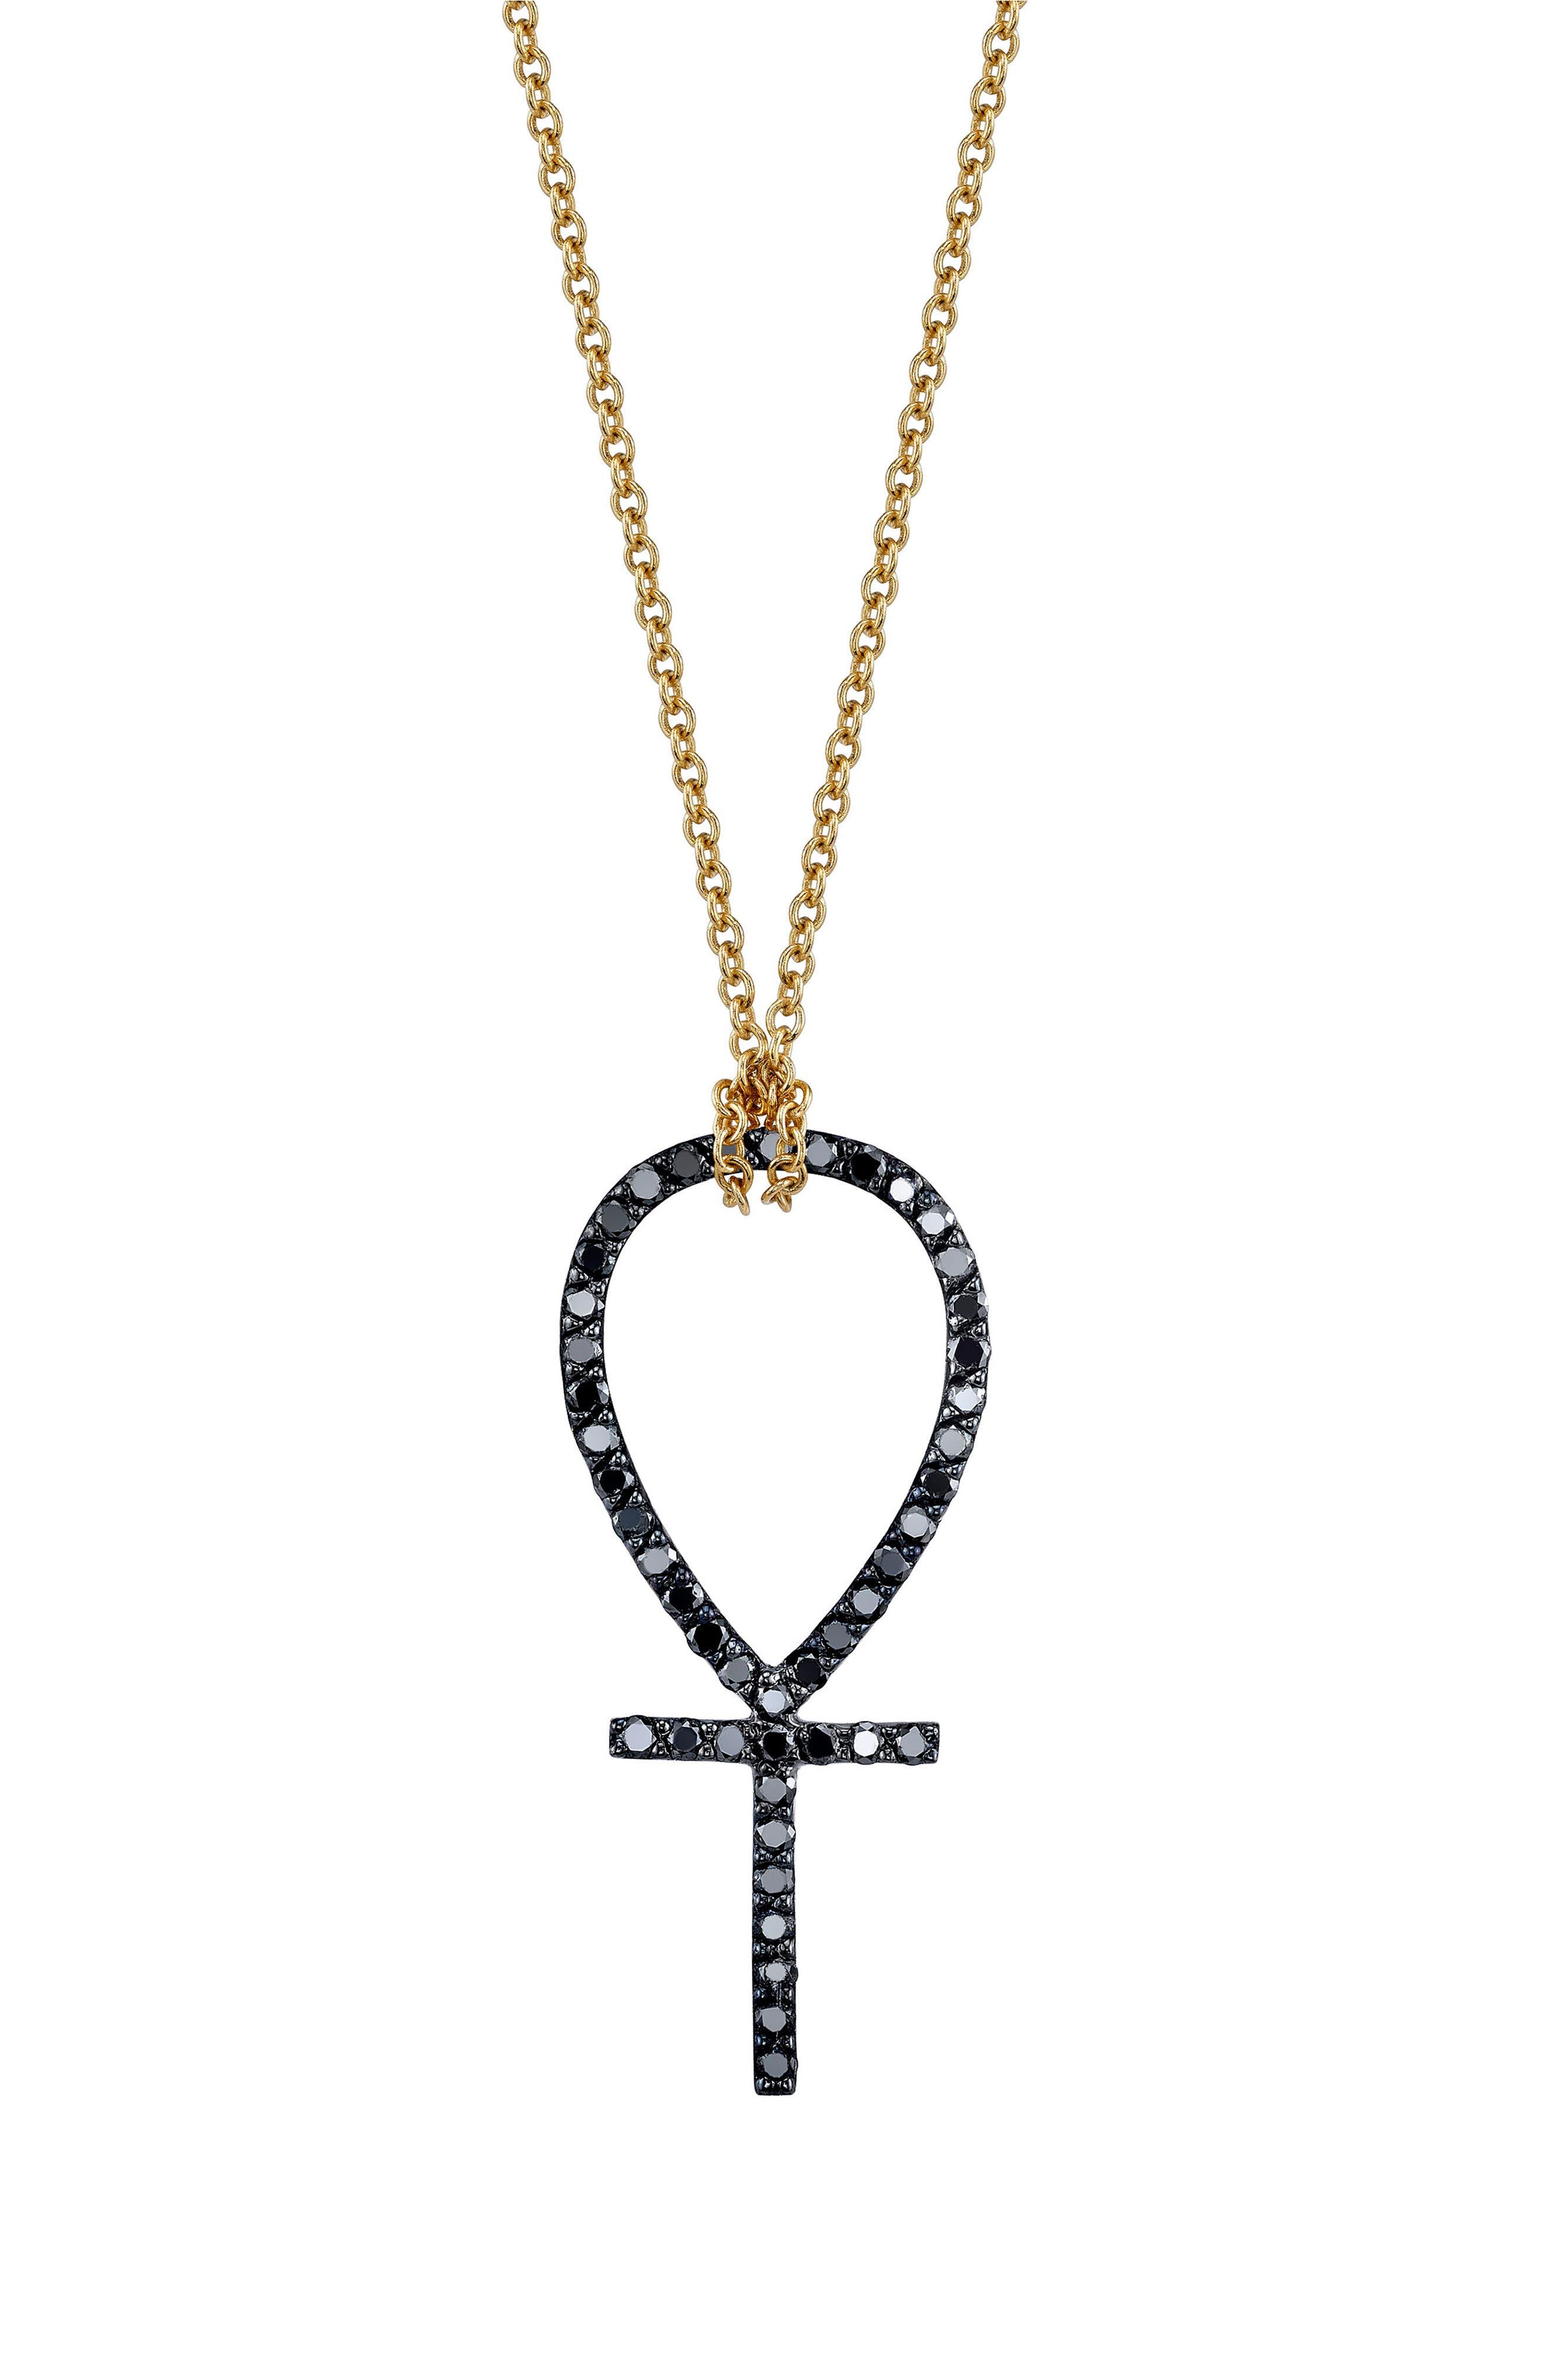 ICONERY X Rashida Jones Black Diamond Ankh Pendant Necklace in Yellow Gold